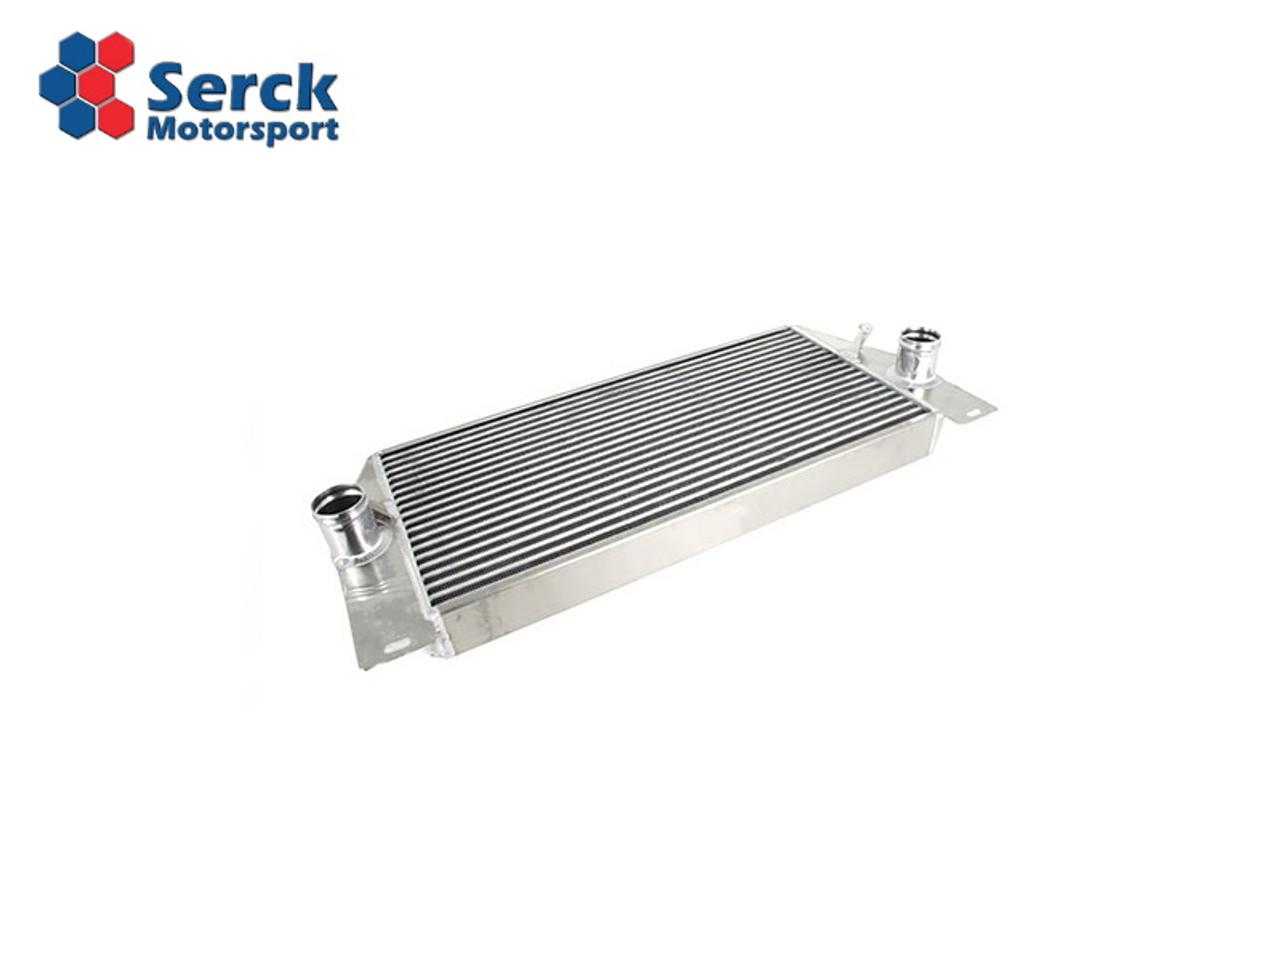 Serck Motorsport  Intercooler for Fast Road Fine Fins TD5/TDCI - TF182